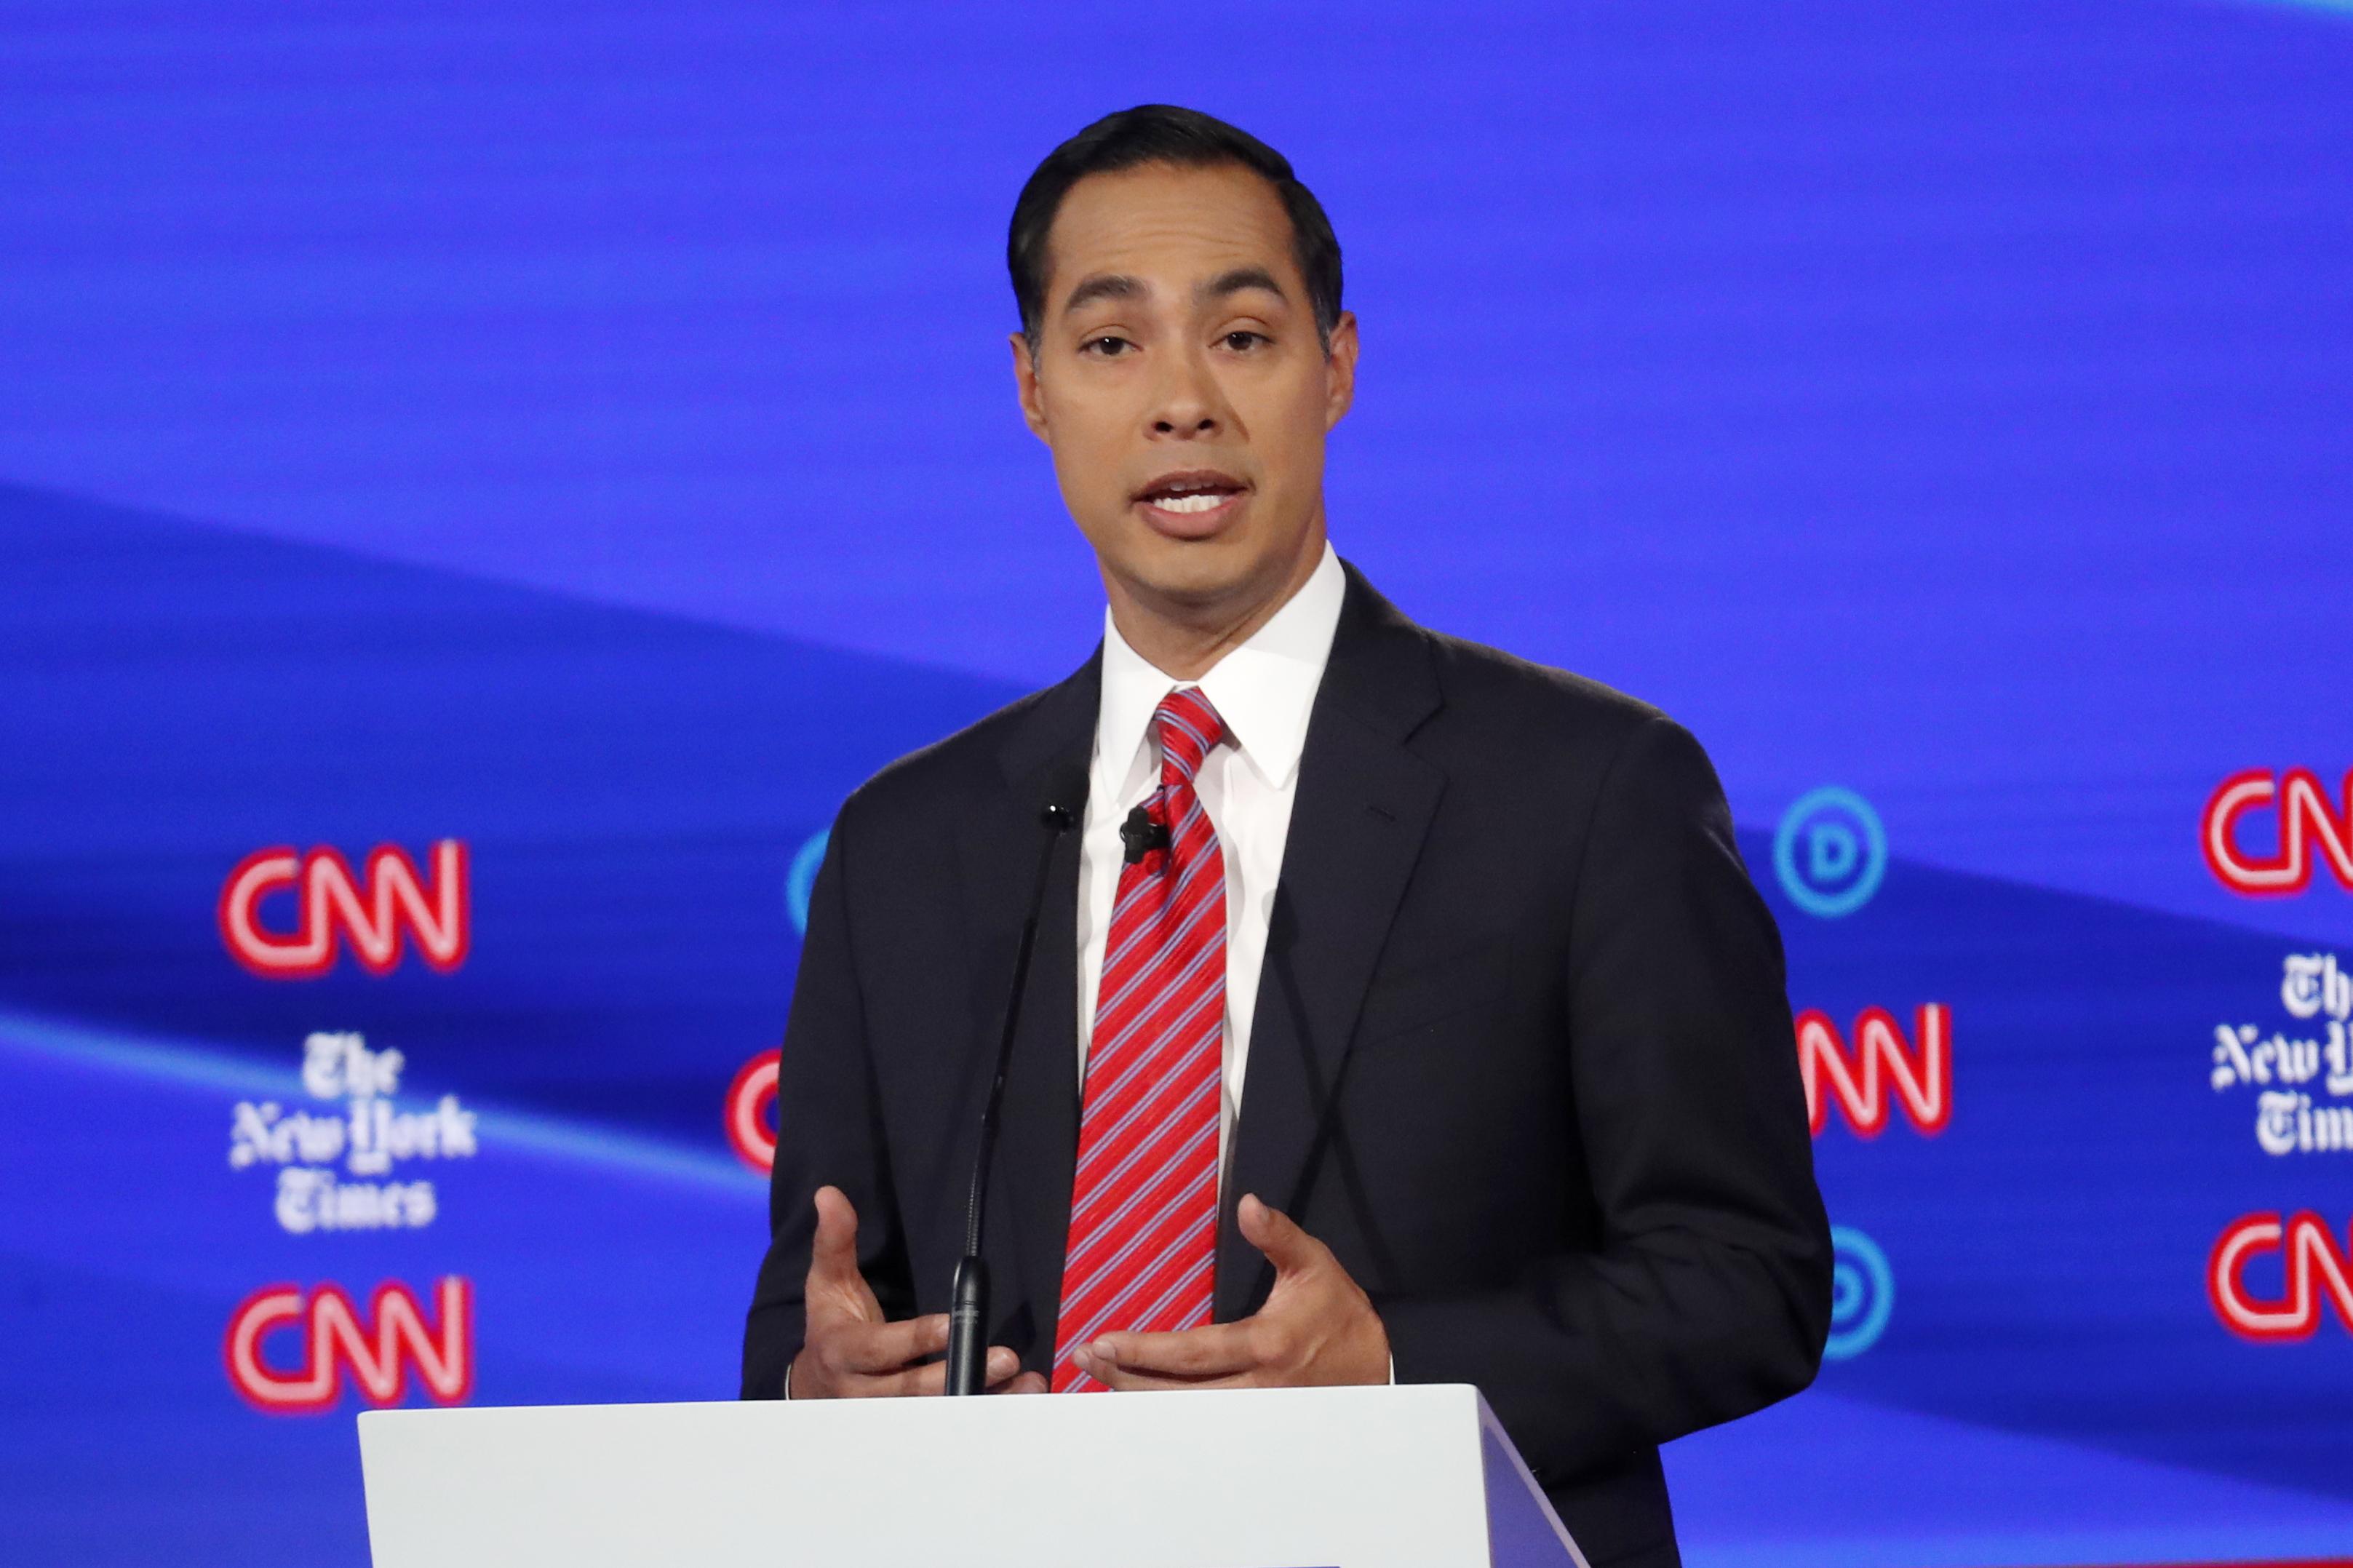 Julian Castro slams CNN for 'significant gaps' in debate questions: 'It's journalistic malpractice'